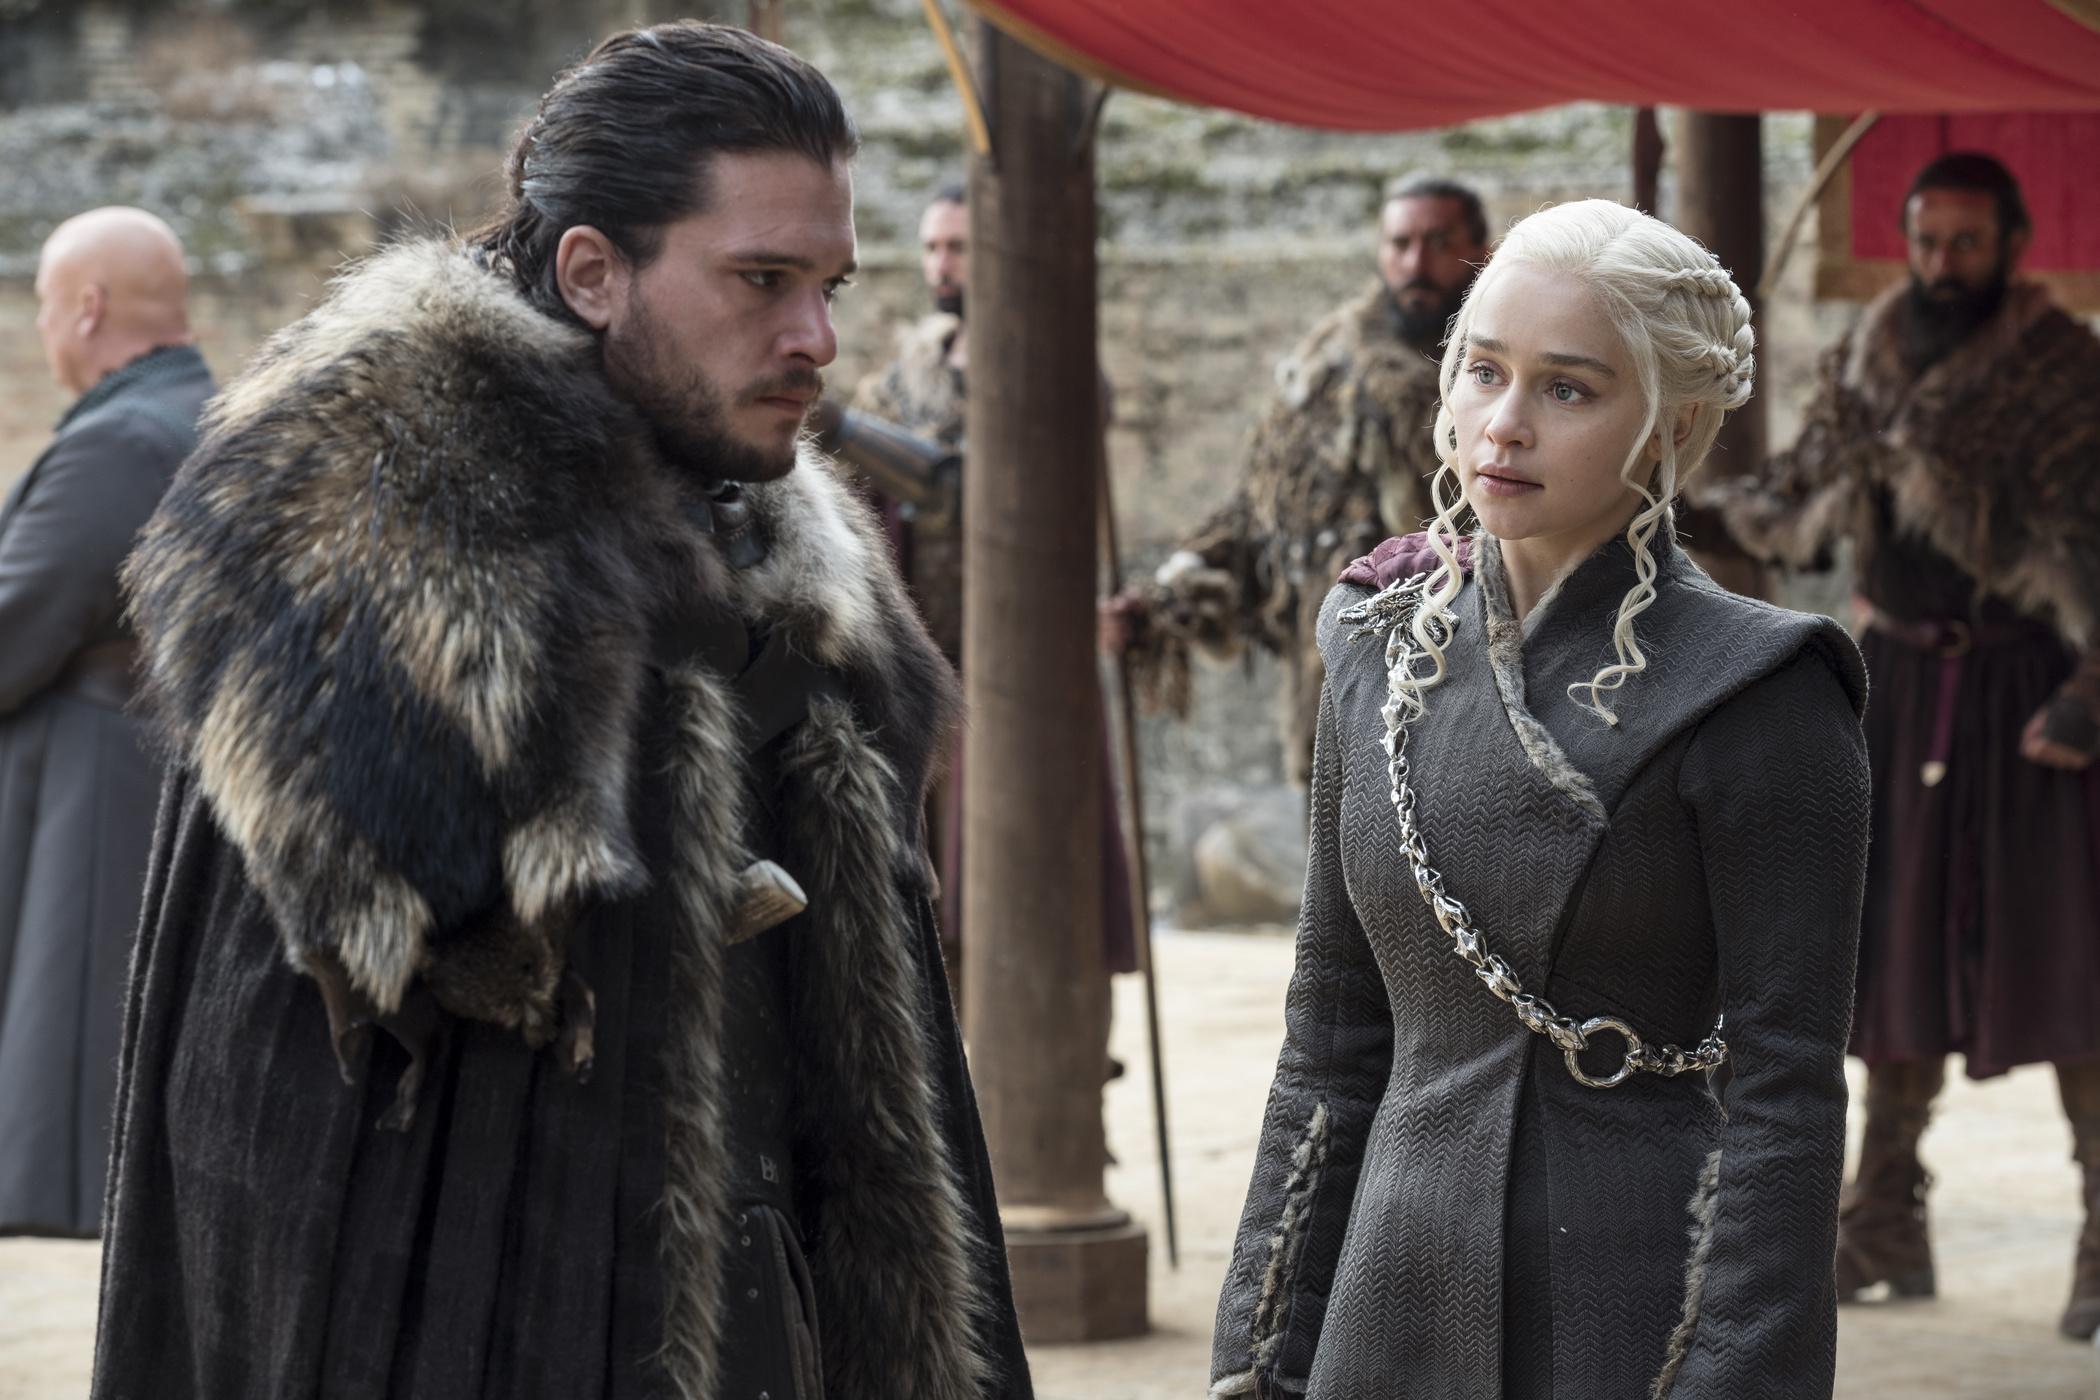 TV_Game_of_Thrones_Finale_25886-159532.jpg12618574